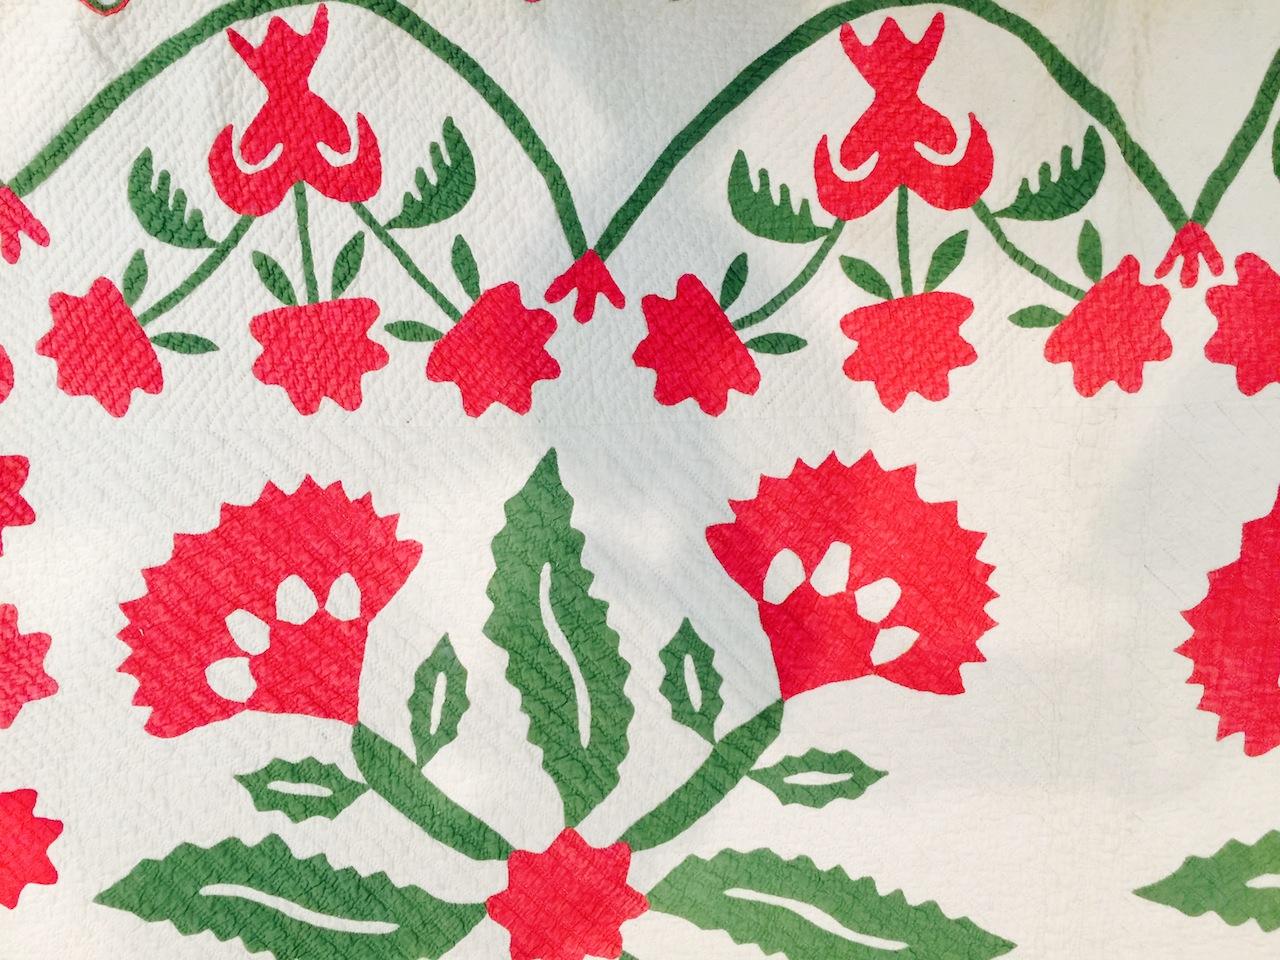 detail of Coxcomb Flower quilt by unknown artist (1859)